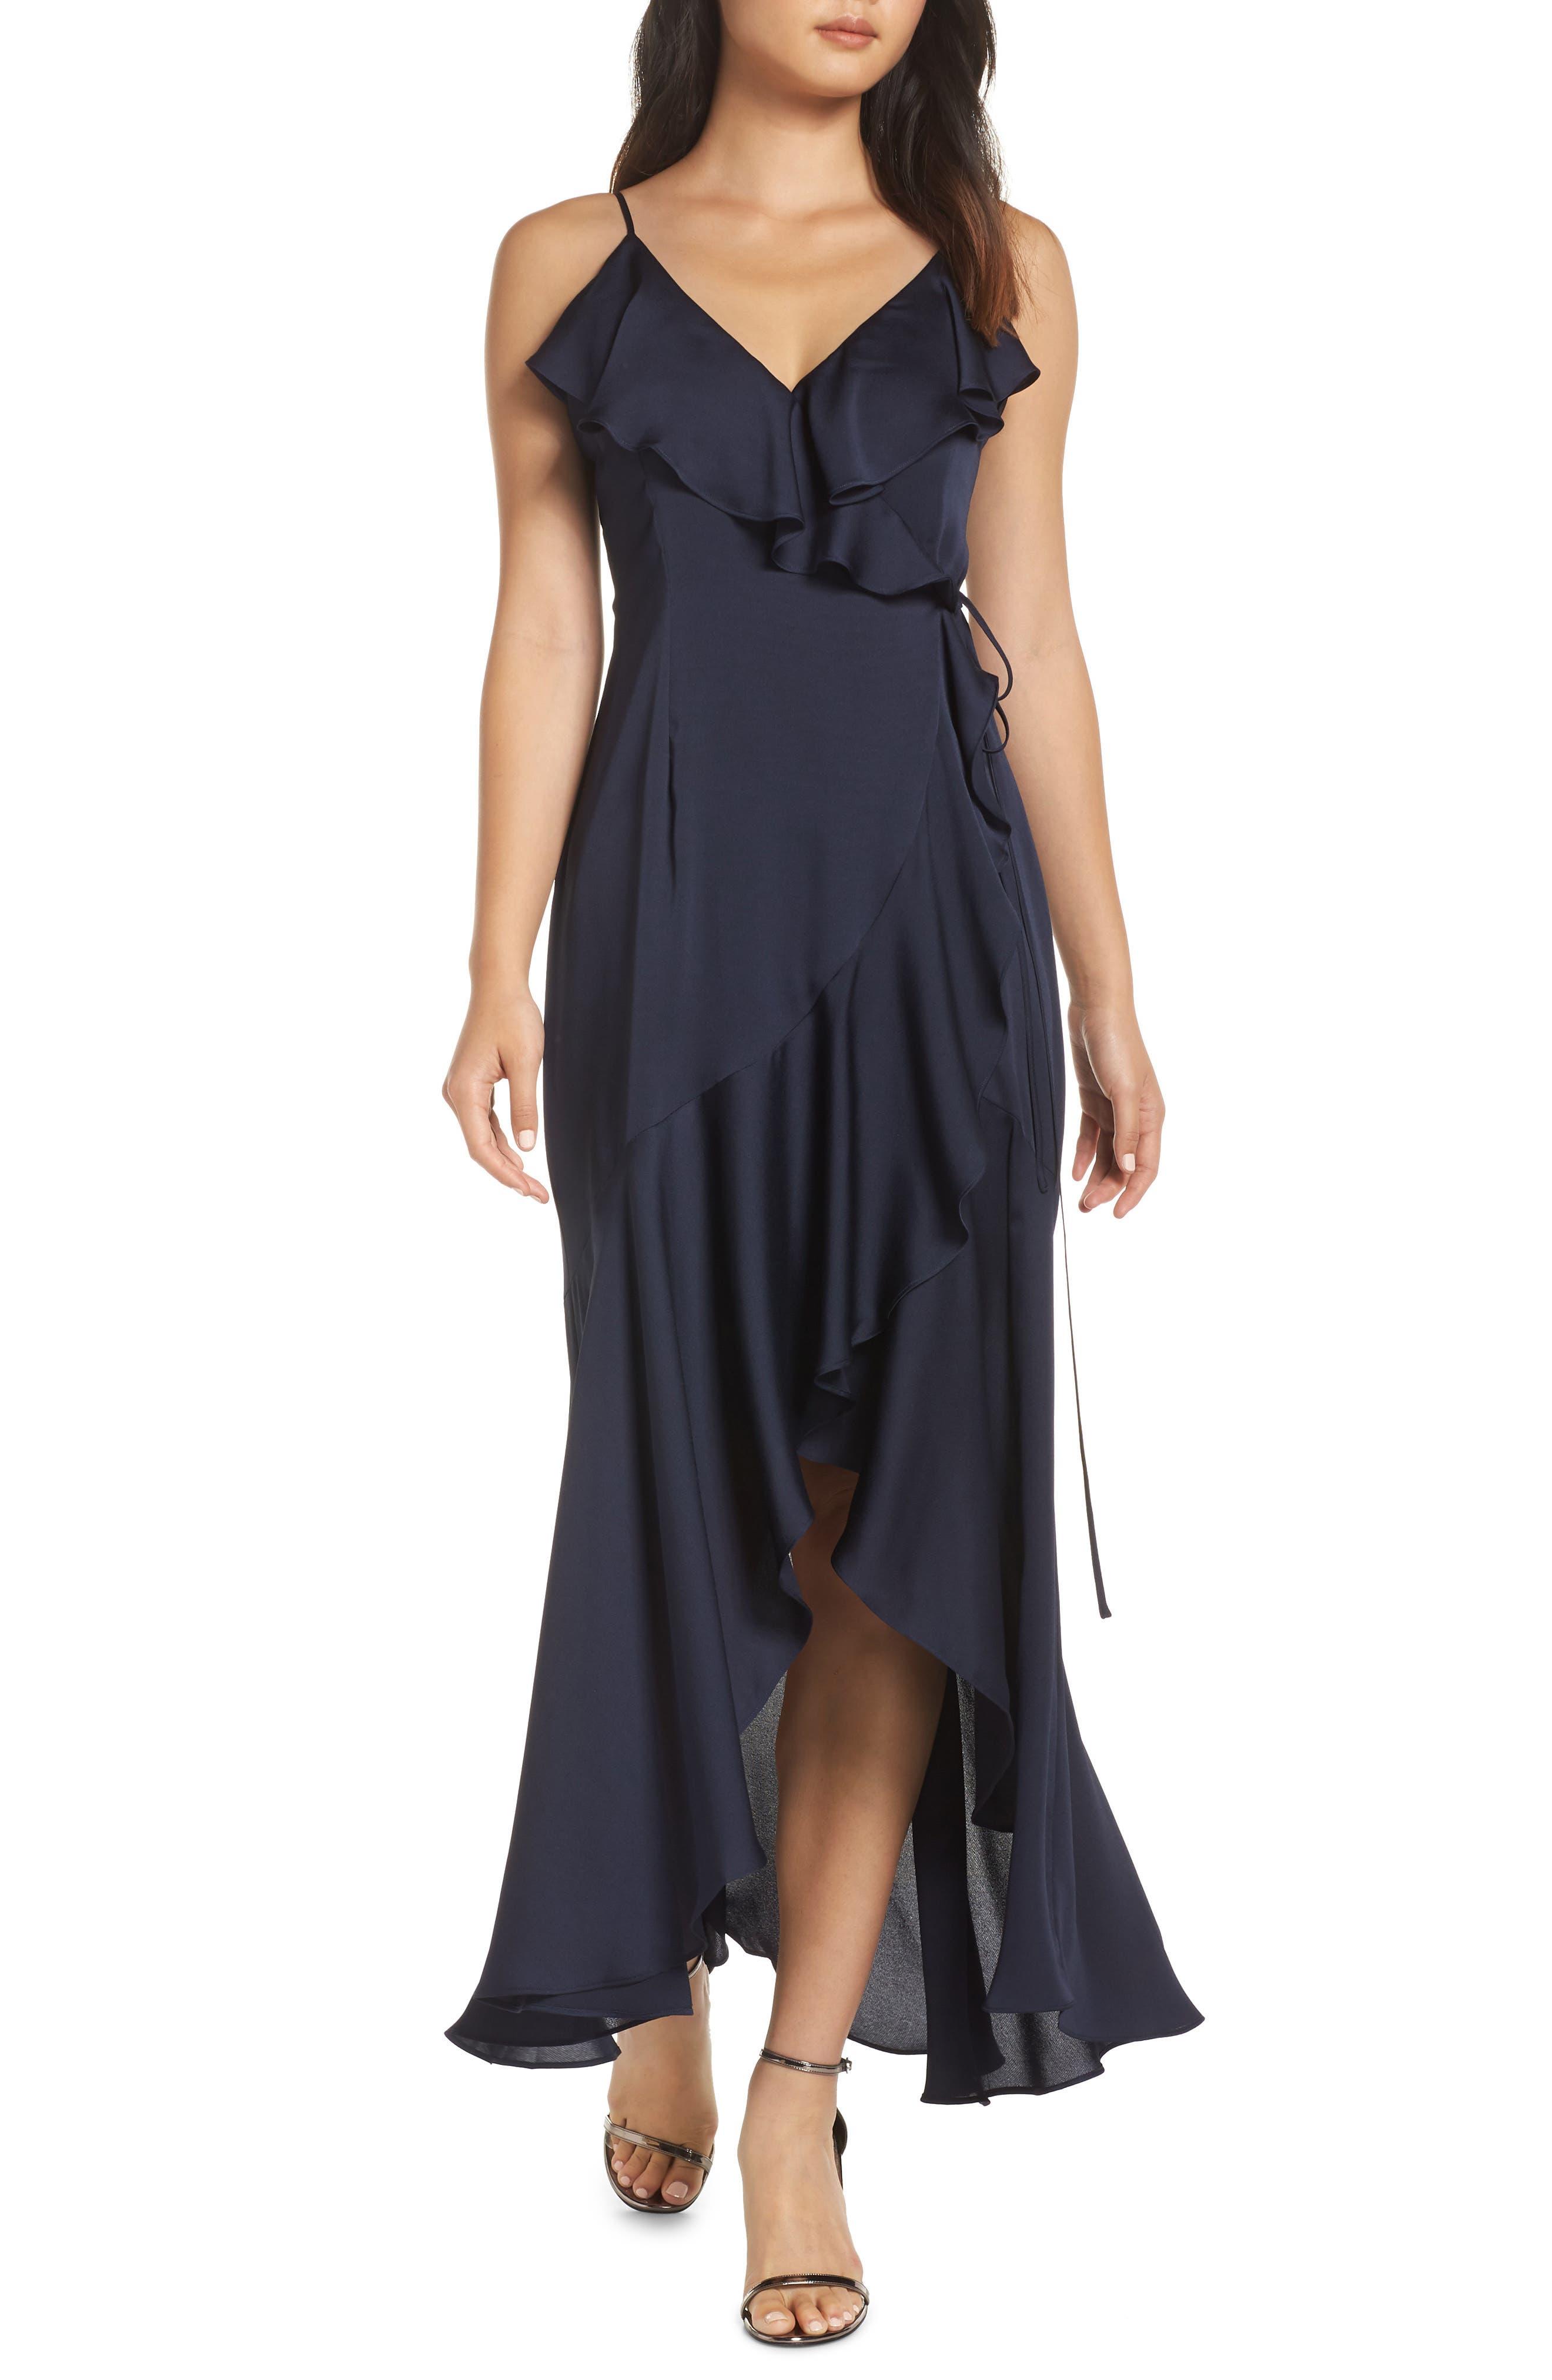 SHONA JOY Luxe Ruffle Trim Wrap Gown in Sapphire